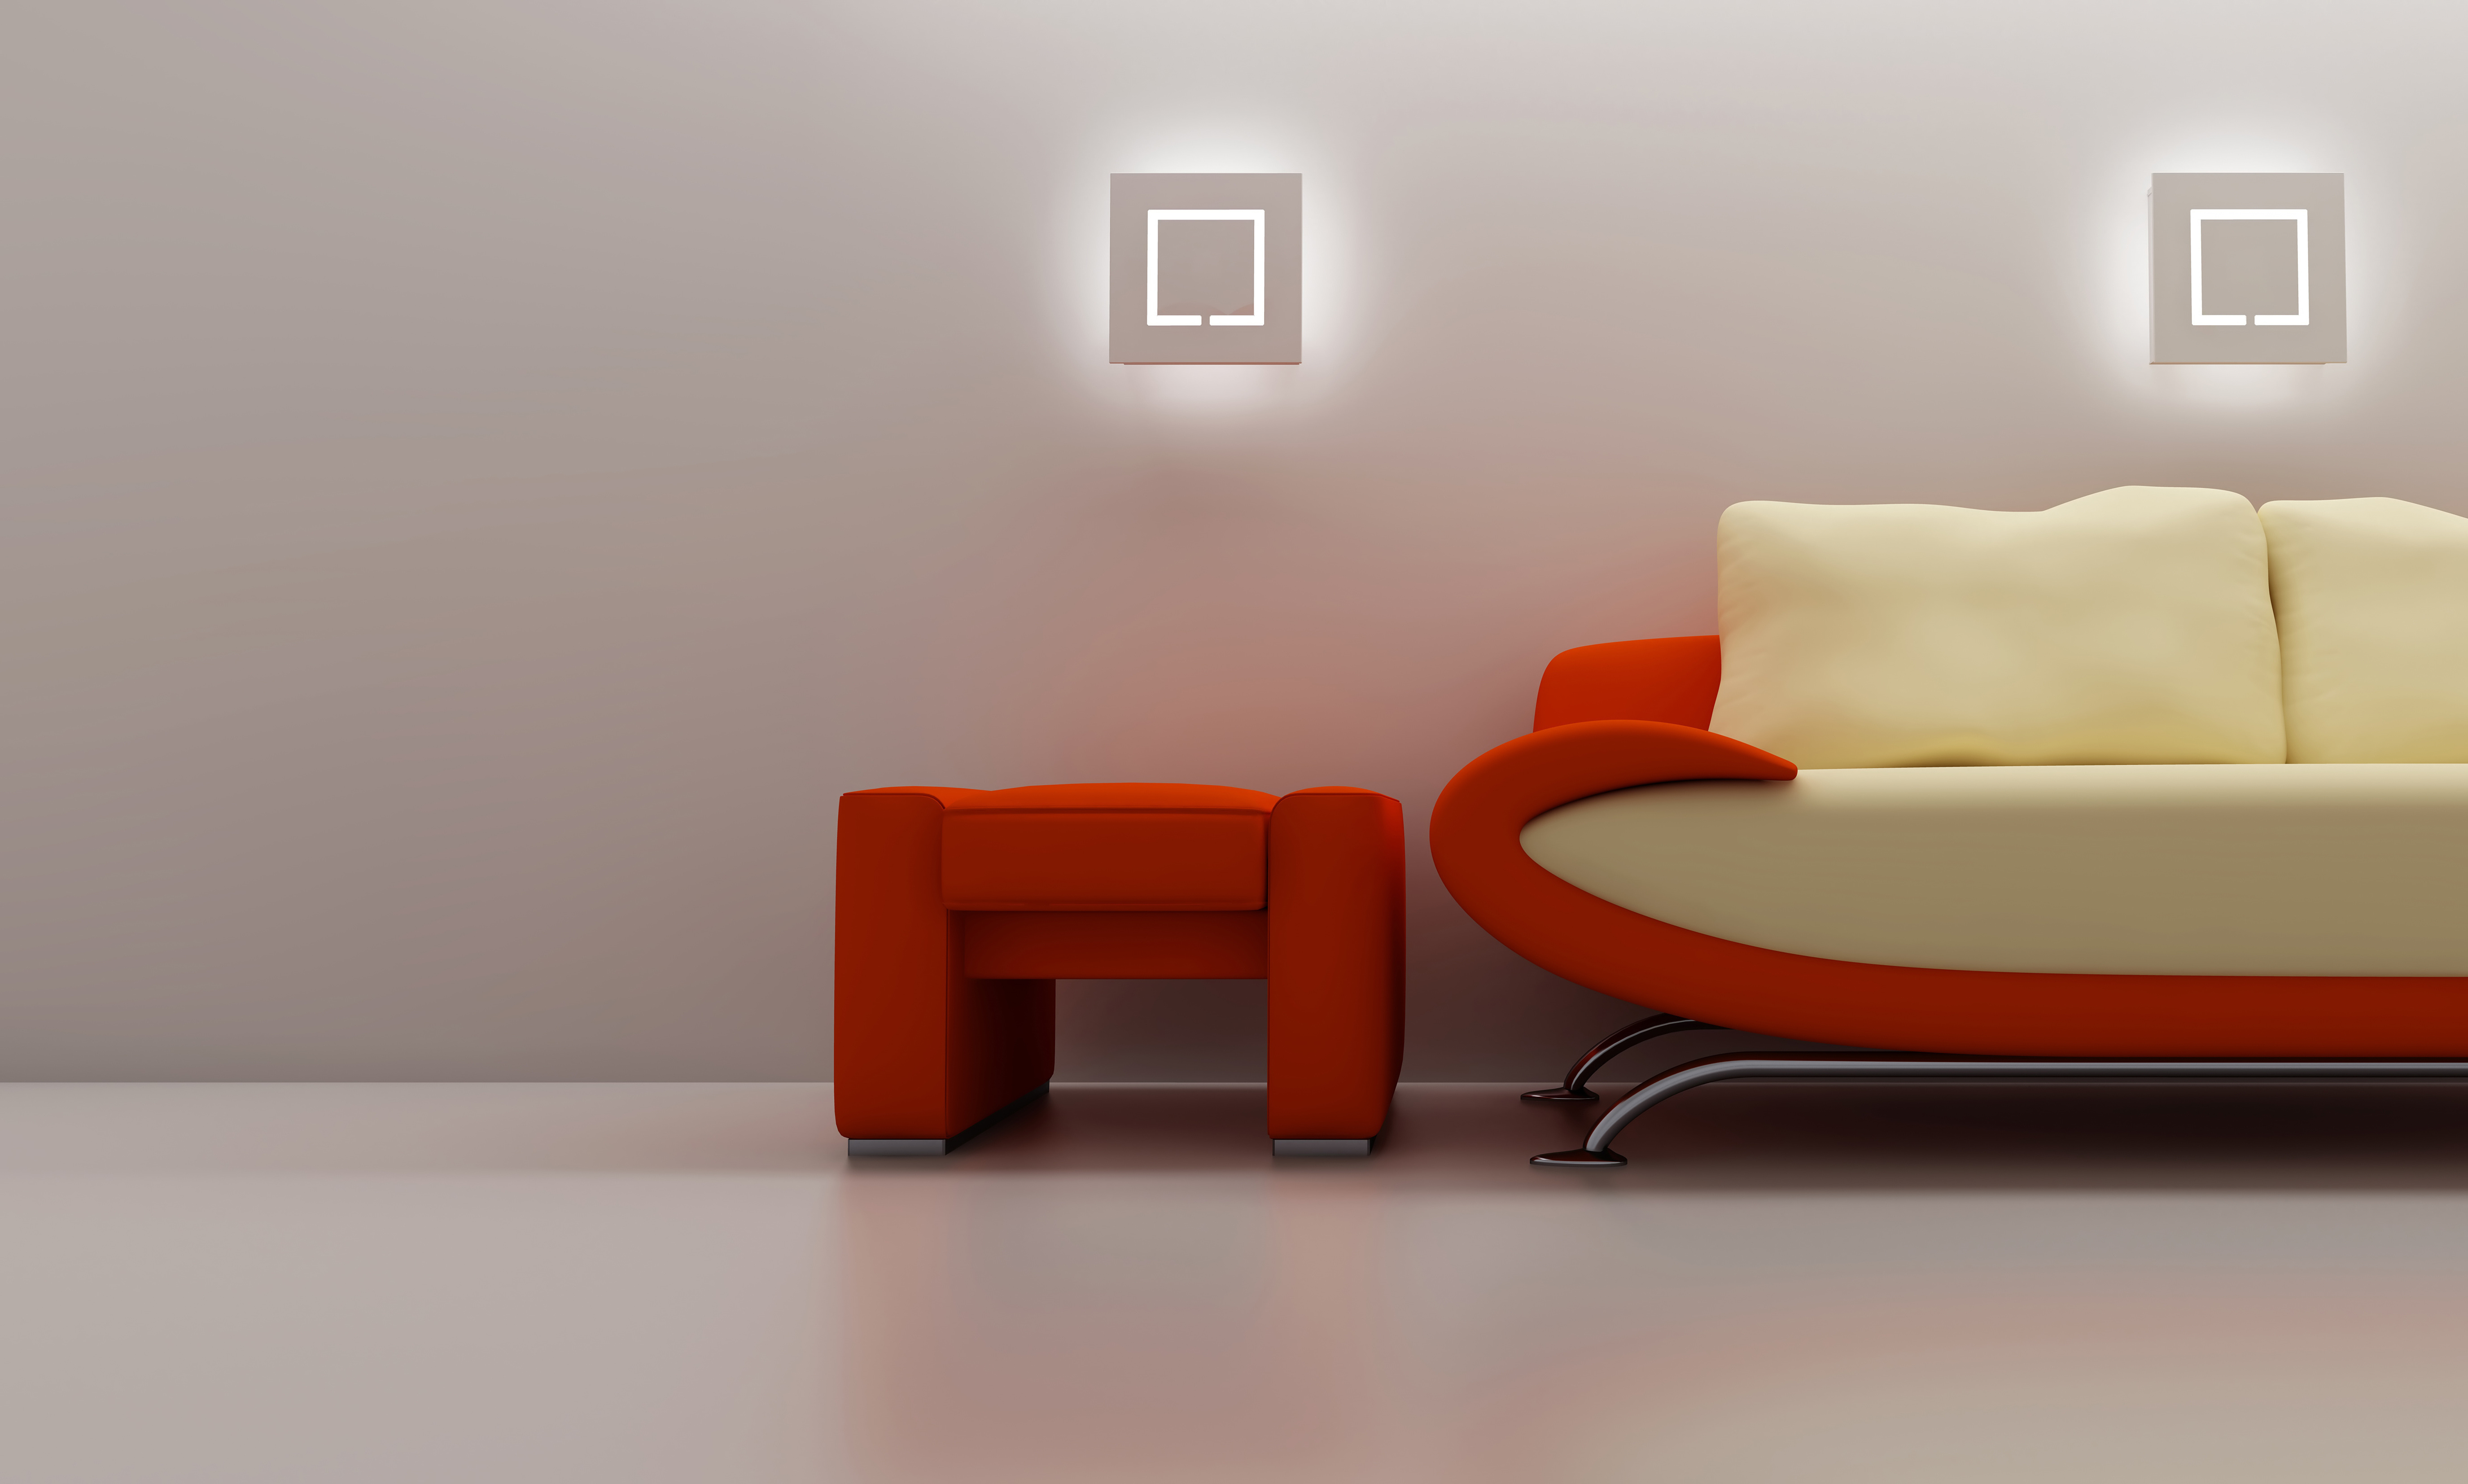 интерьер диван комната  № 3531265 без смс